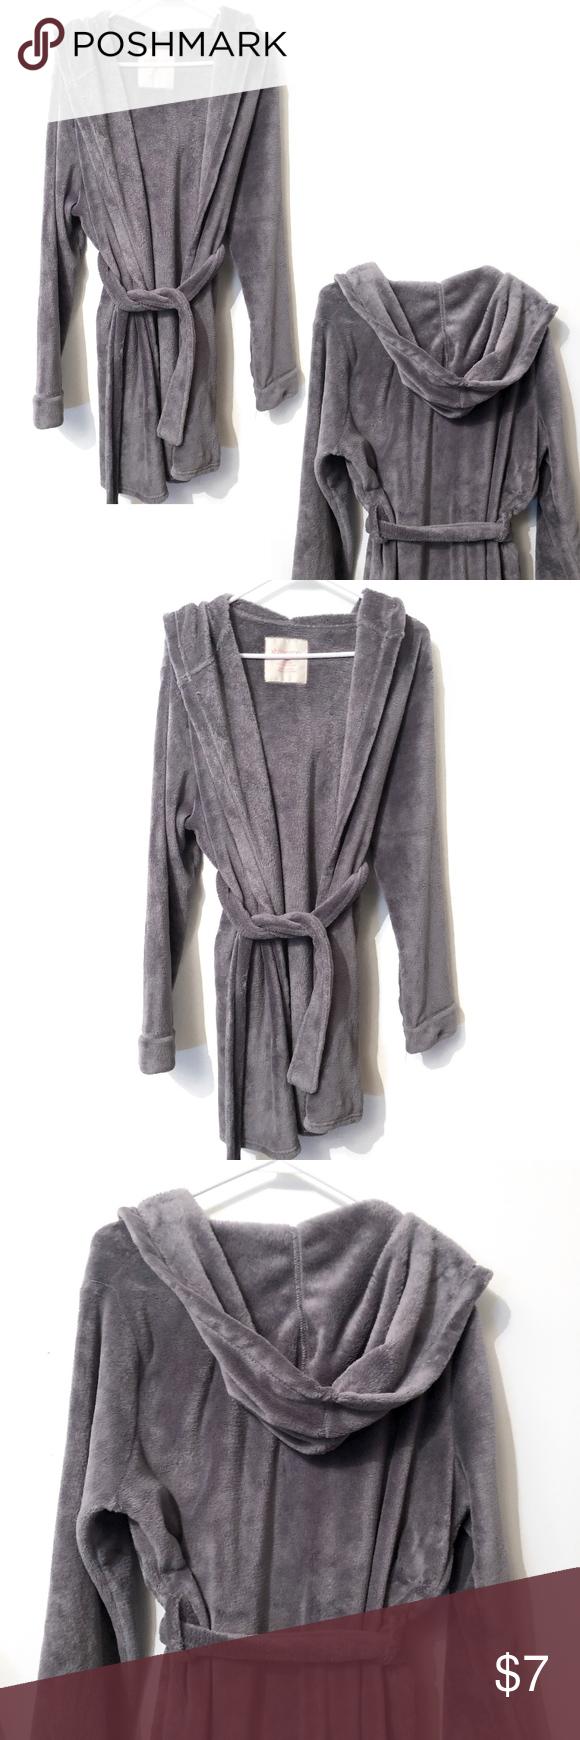 38cff91d60 ... lowest price d06f2 c926a XHILARATION - Womens Sleepwear Short Hooded  Robe ...